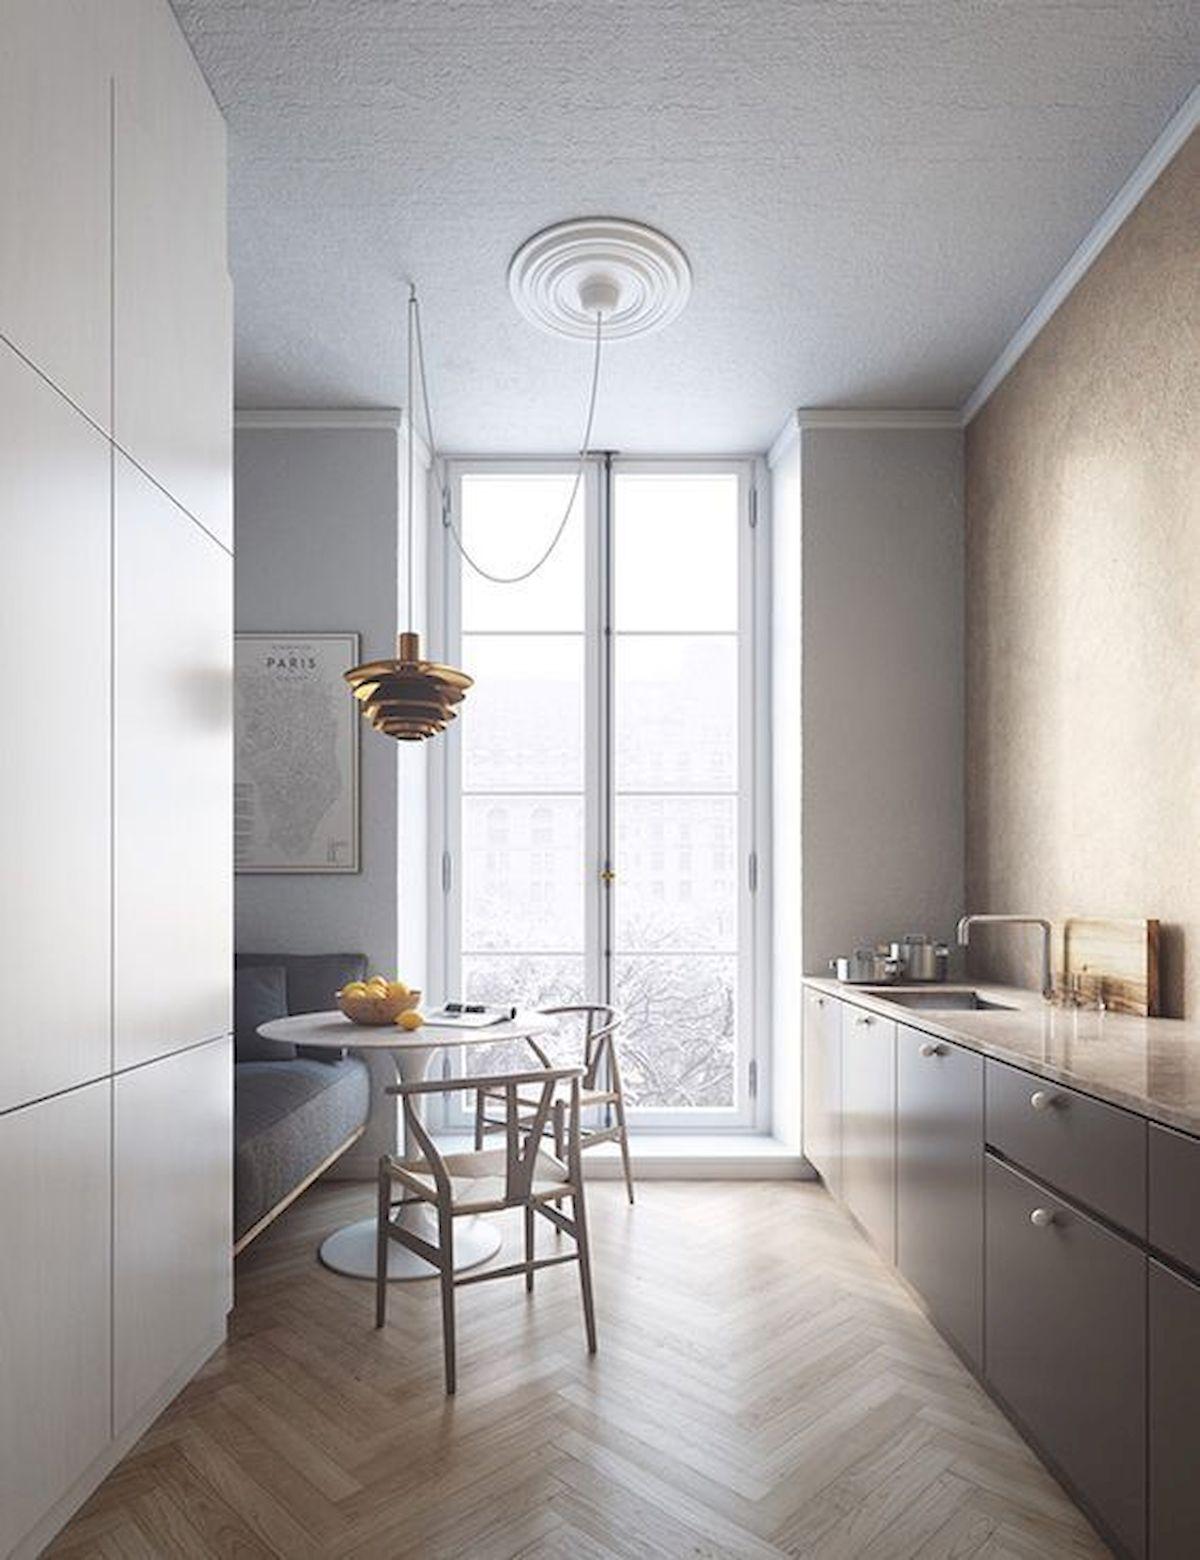 40 Best Tile Flooring Designs Ideas For Modern Kitchen (26)